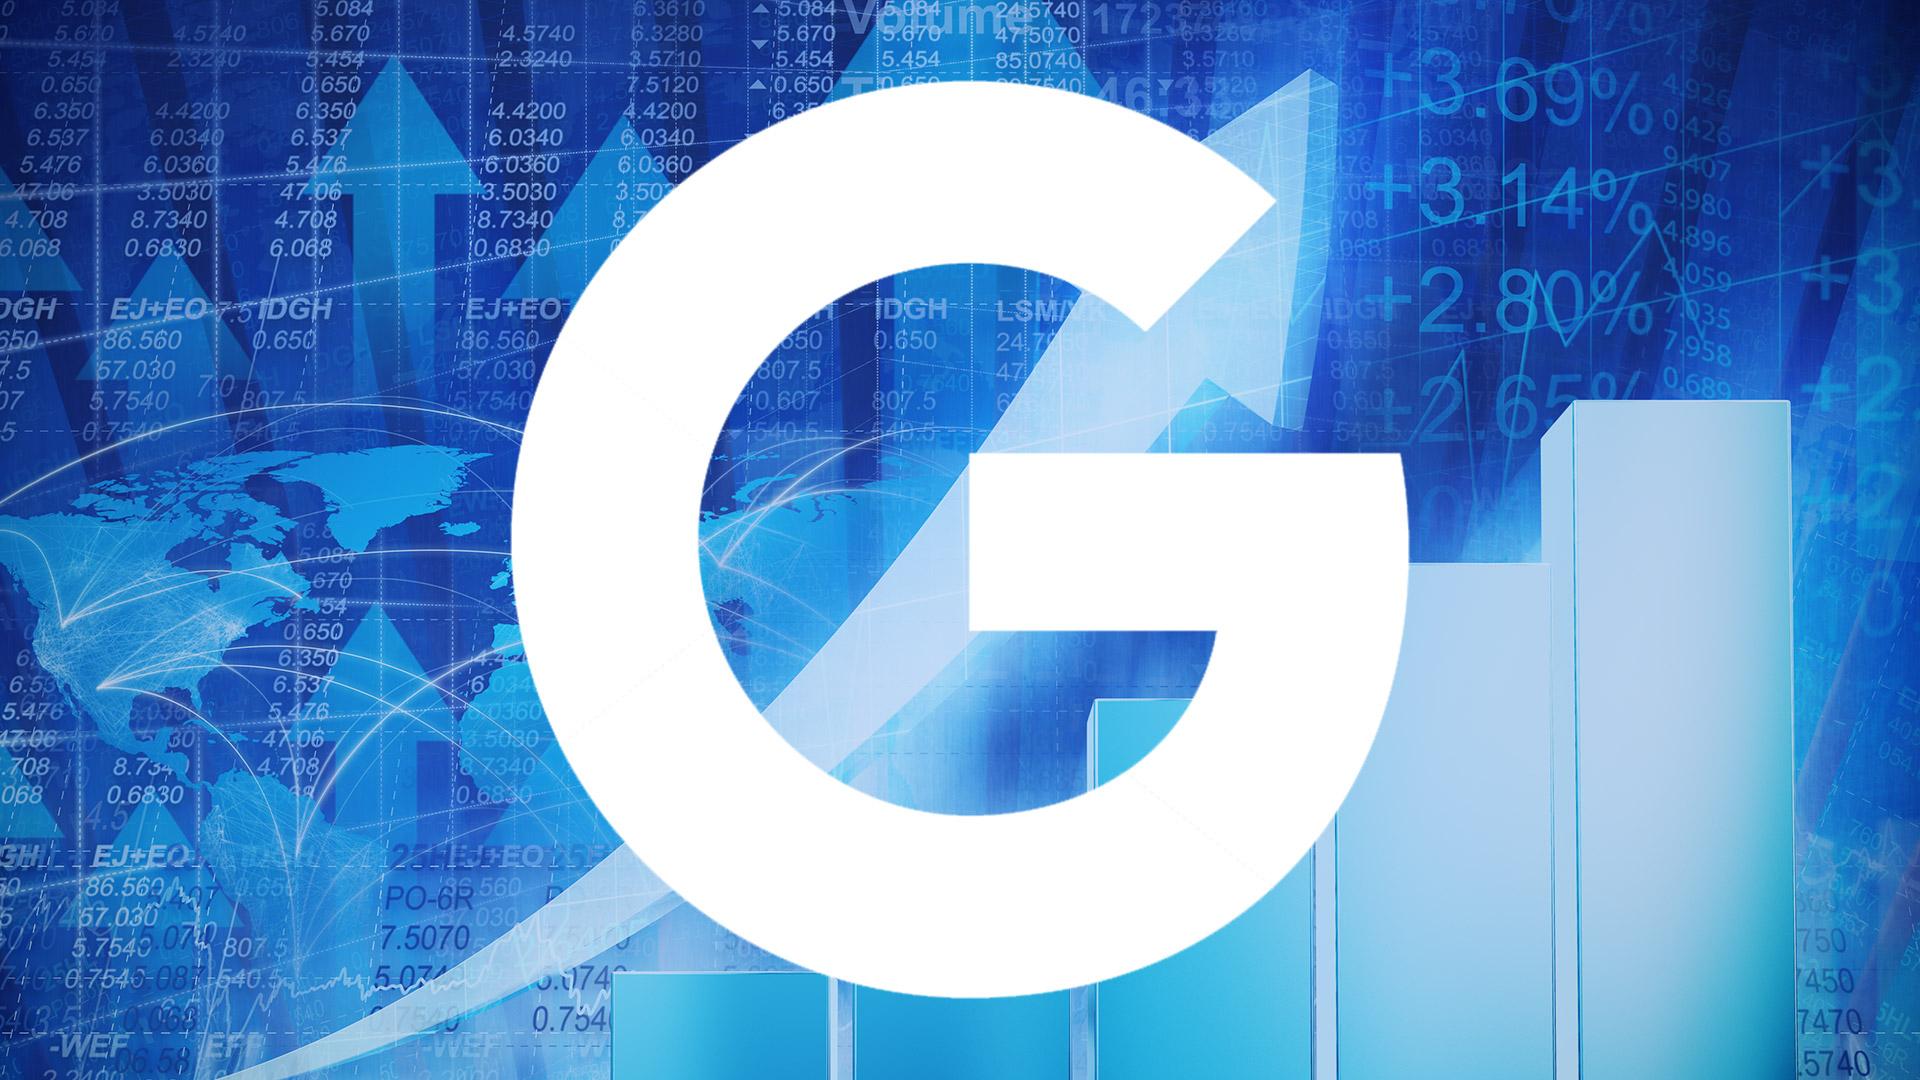 google-growth-analytics-data-increase-ss-1920